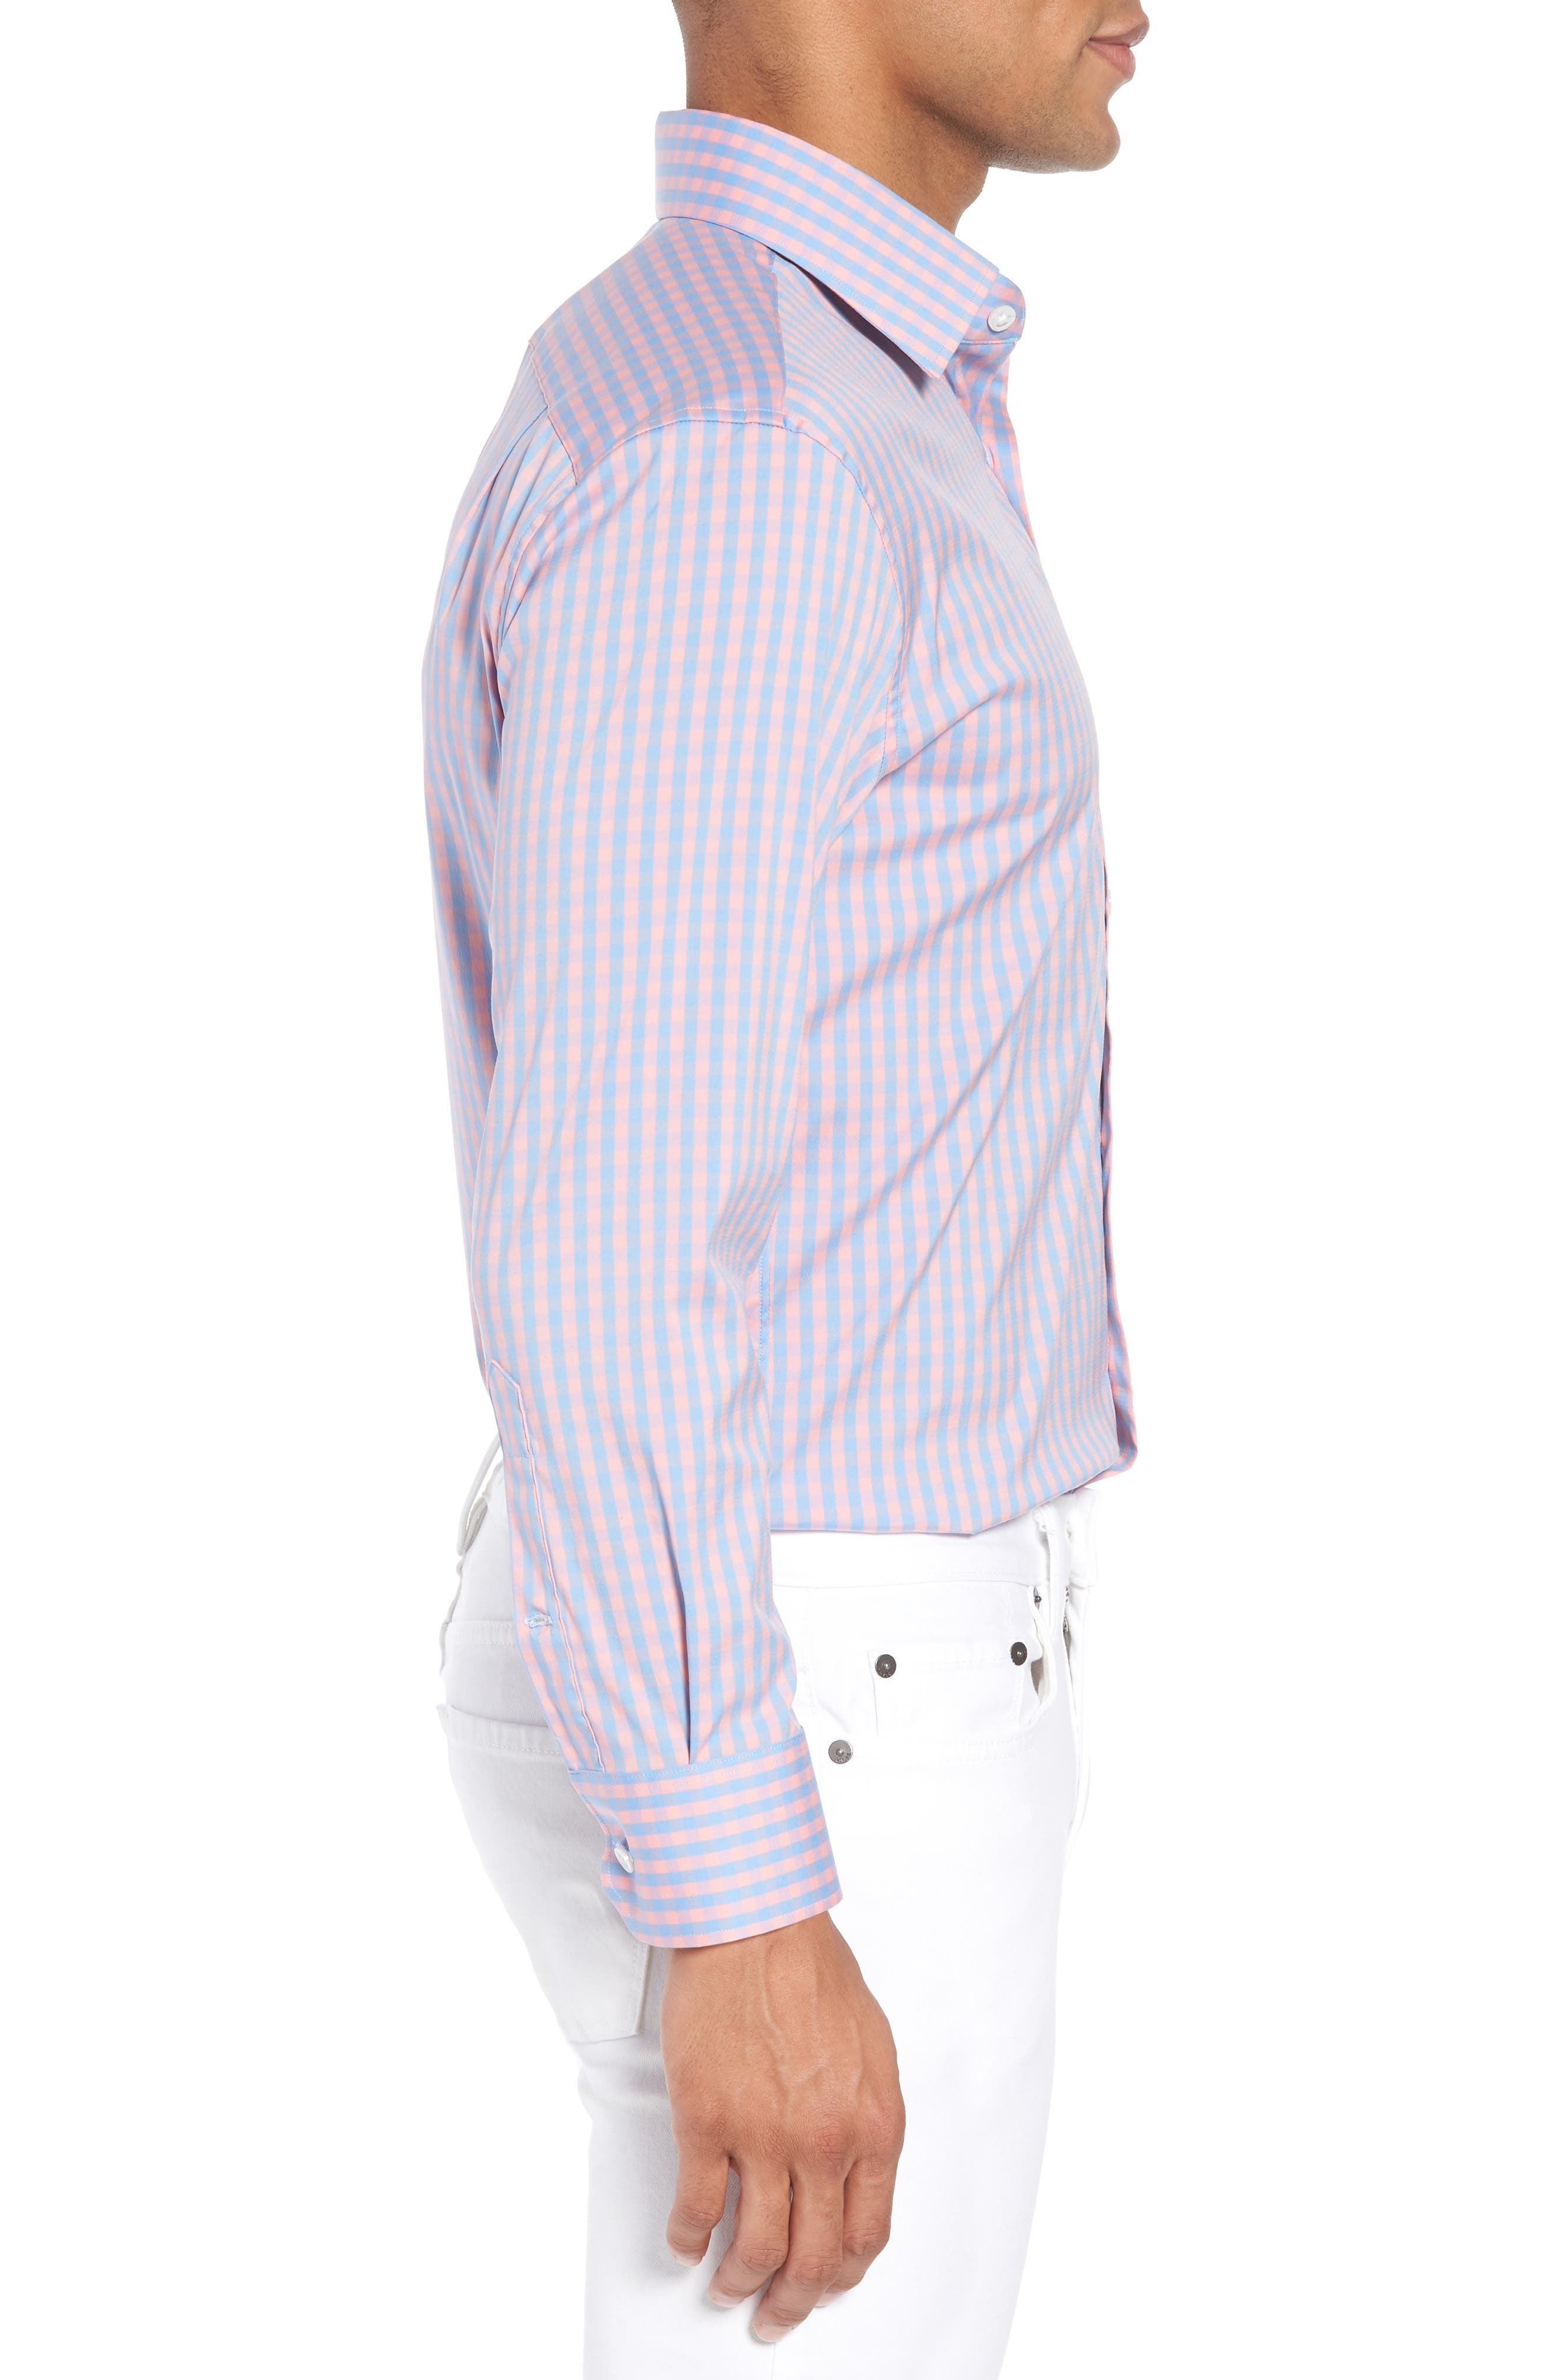 Jetsetter Slim Fit Stretch Check Dress Shirt,                             Alternate thumbnail 4, color,